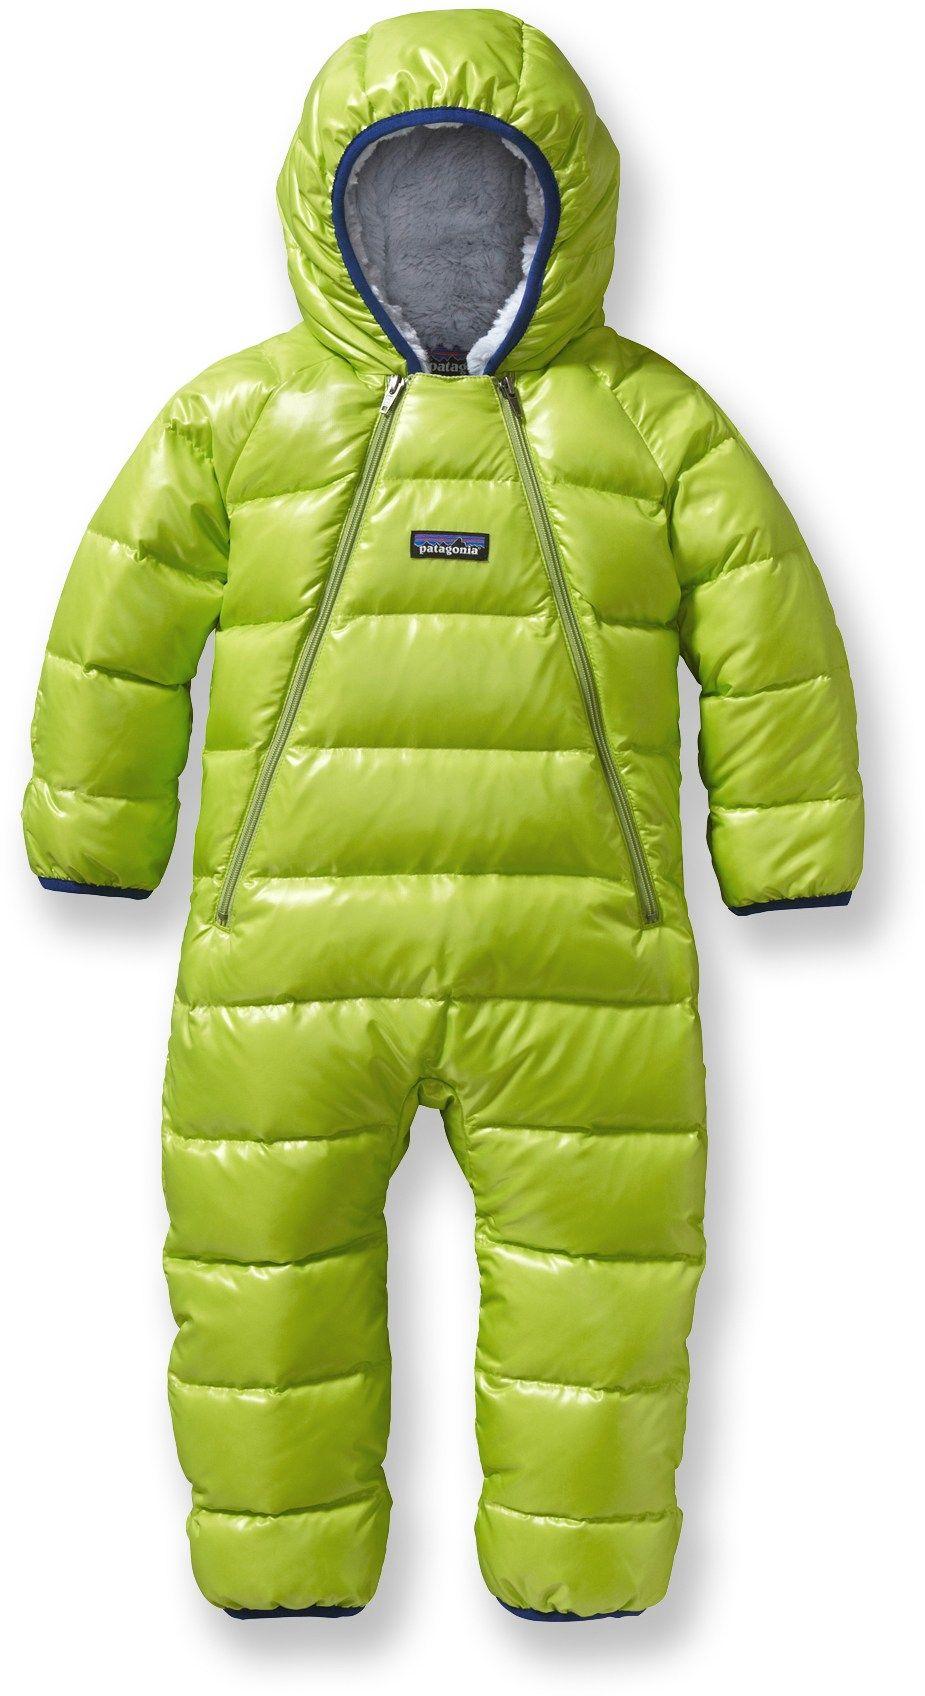 f98b0c537 Patagonia Male Hi-Loft Down Sweater Bunting - Infant Boys ...